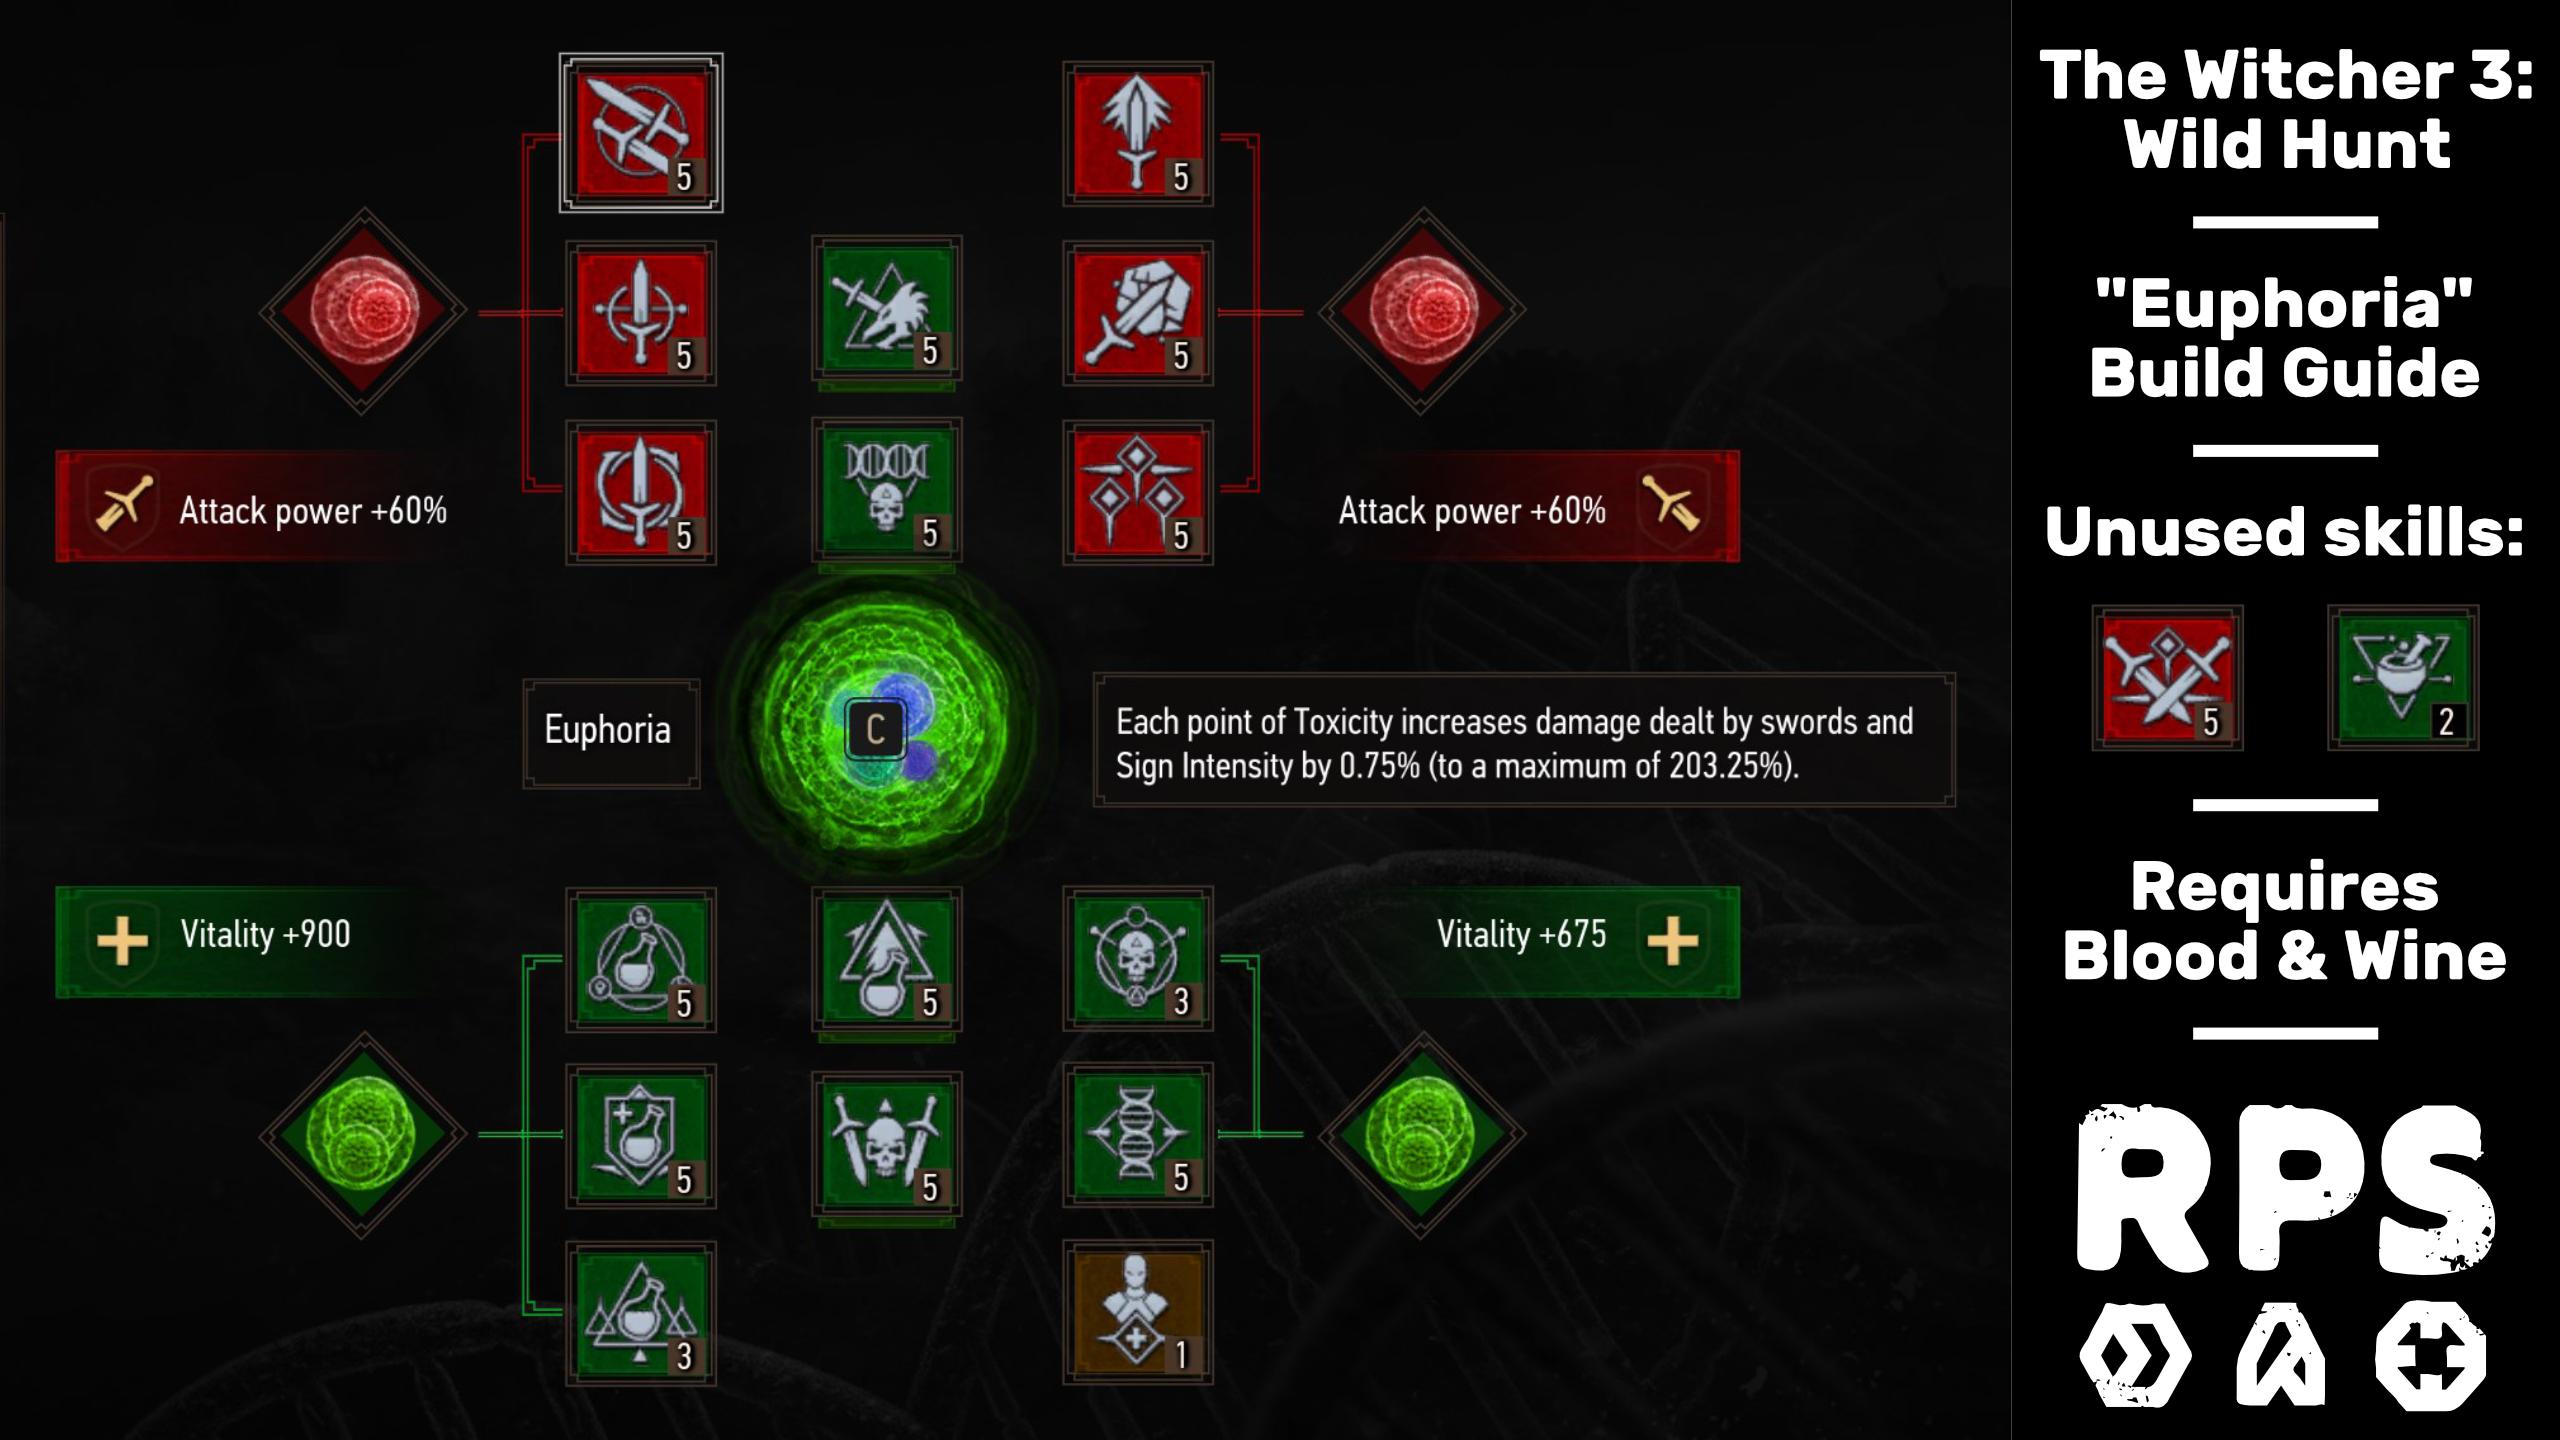 Construcciones de The Witcher 3 - Euphoria build